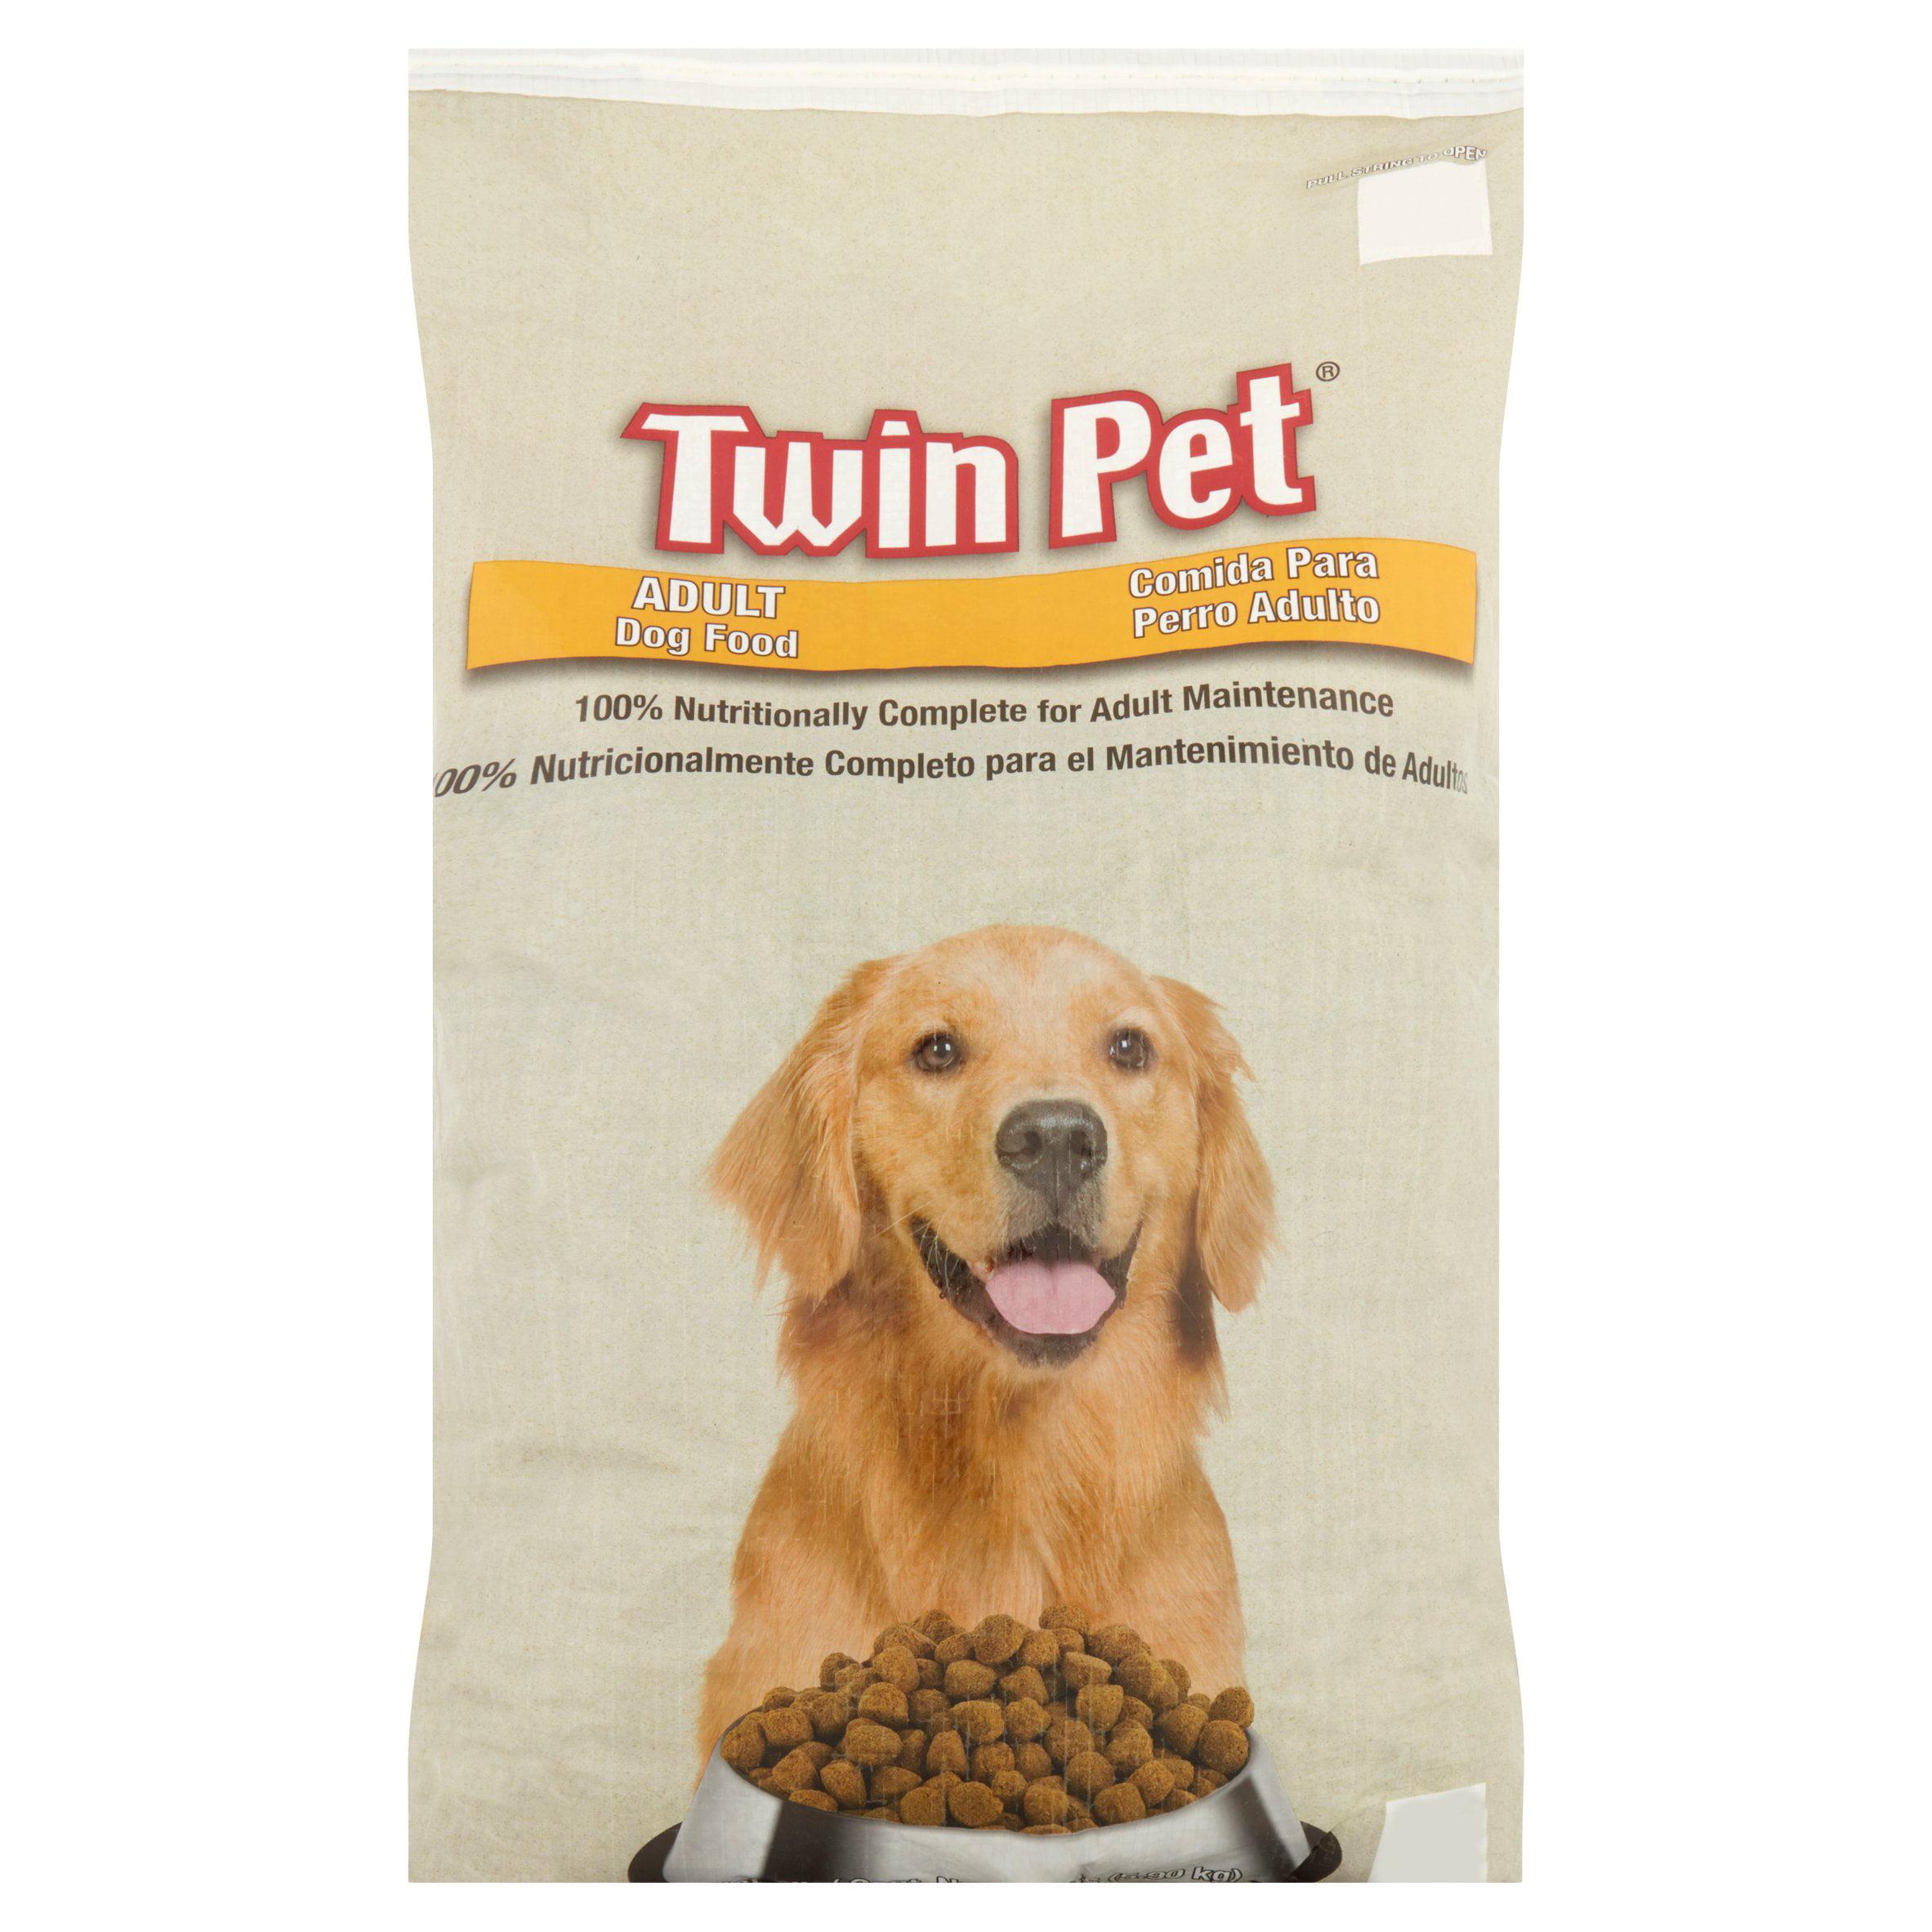 Twin Pet Adult Dog Food, 13 lbs